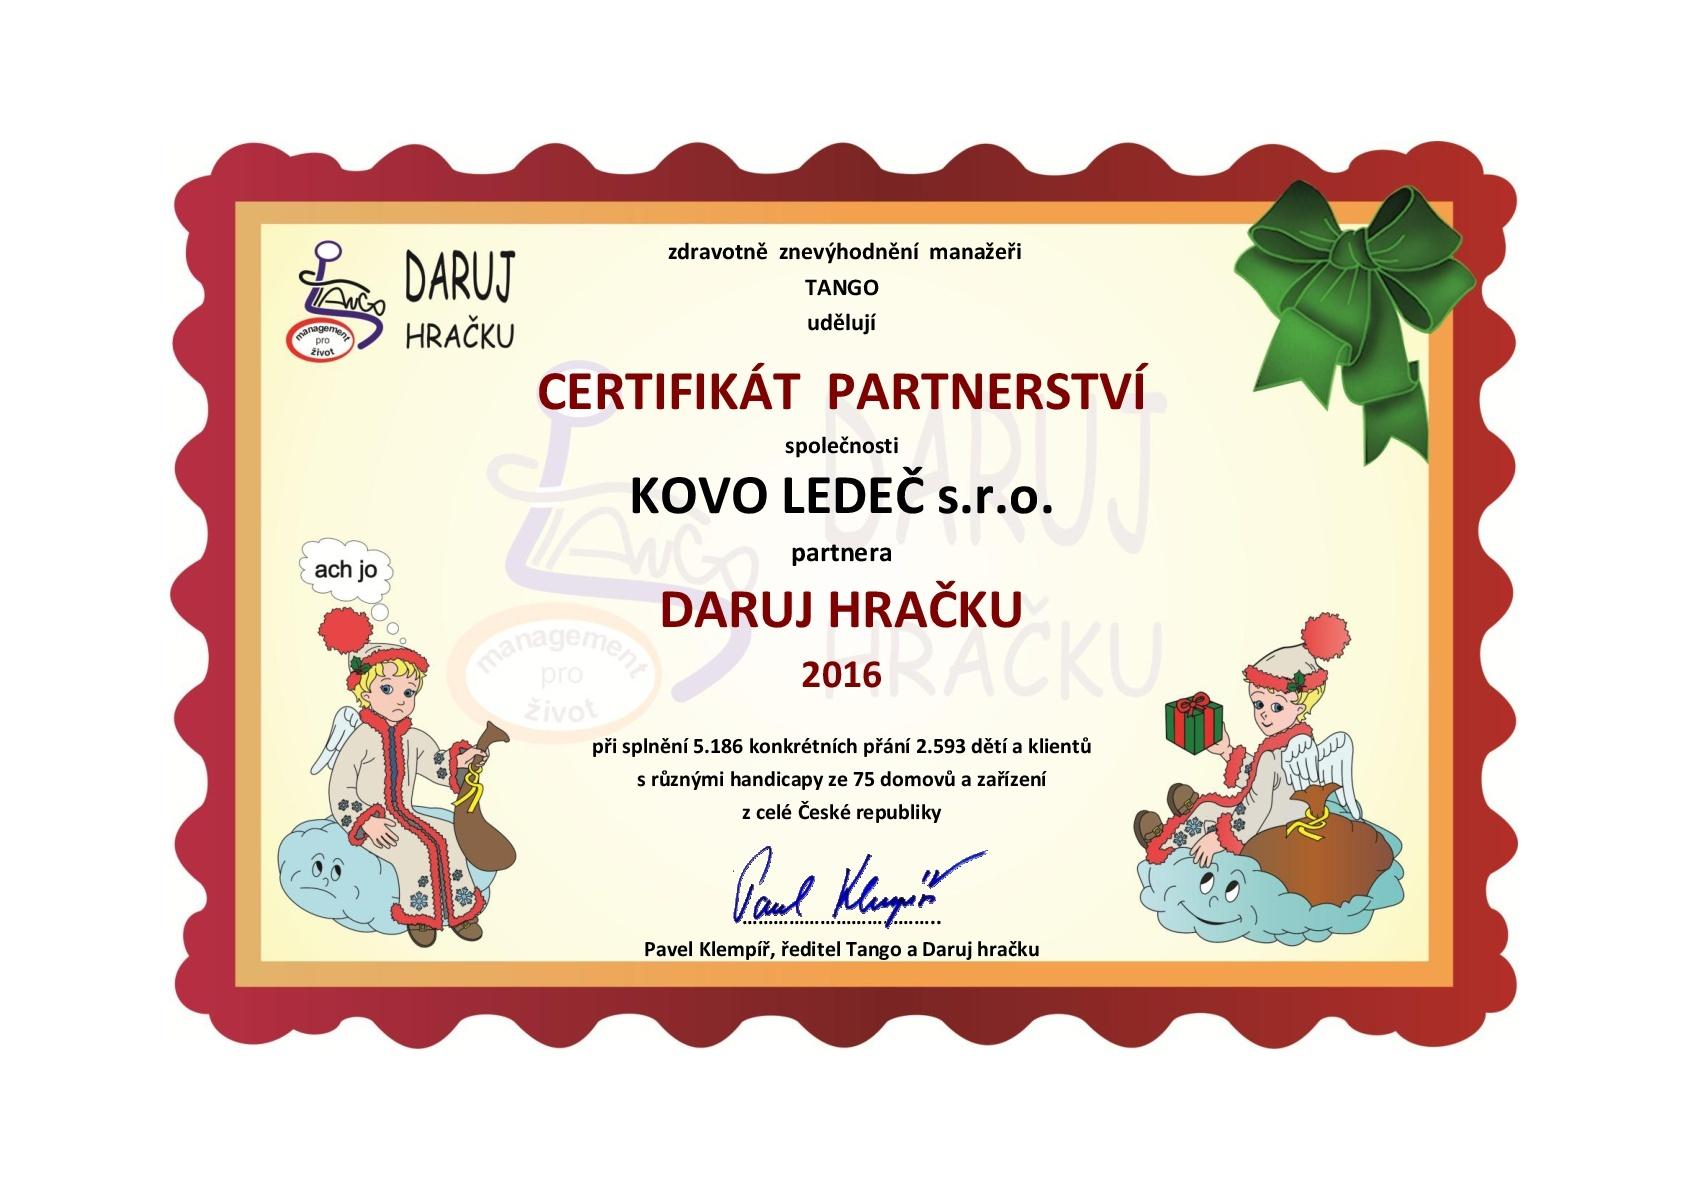 KOVO LEDEČ-Certifikát Daruj hračku-Tango-2016-001